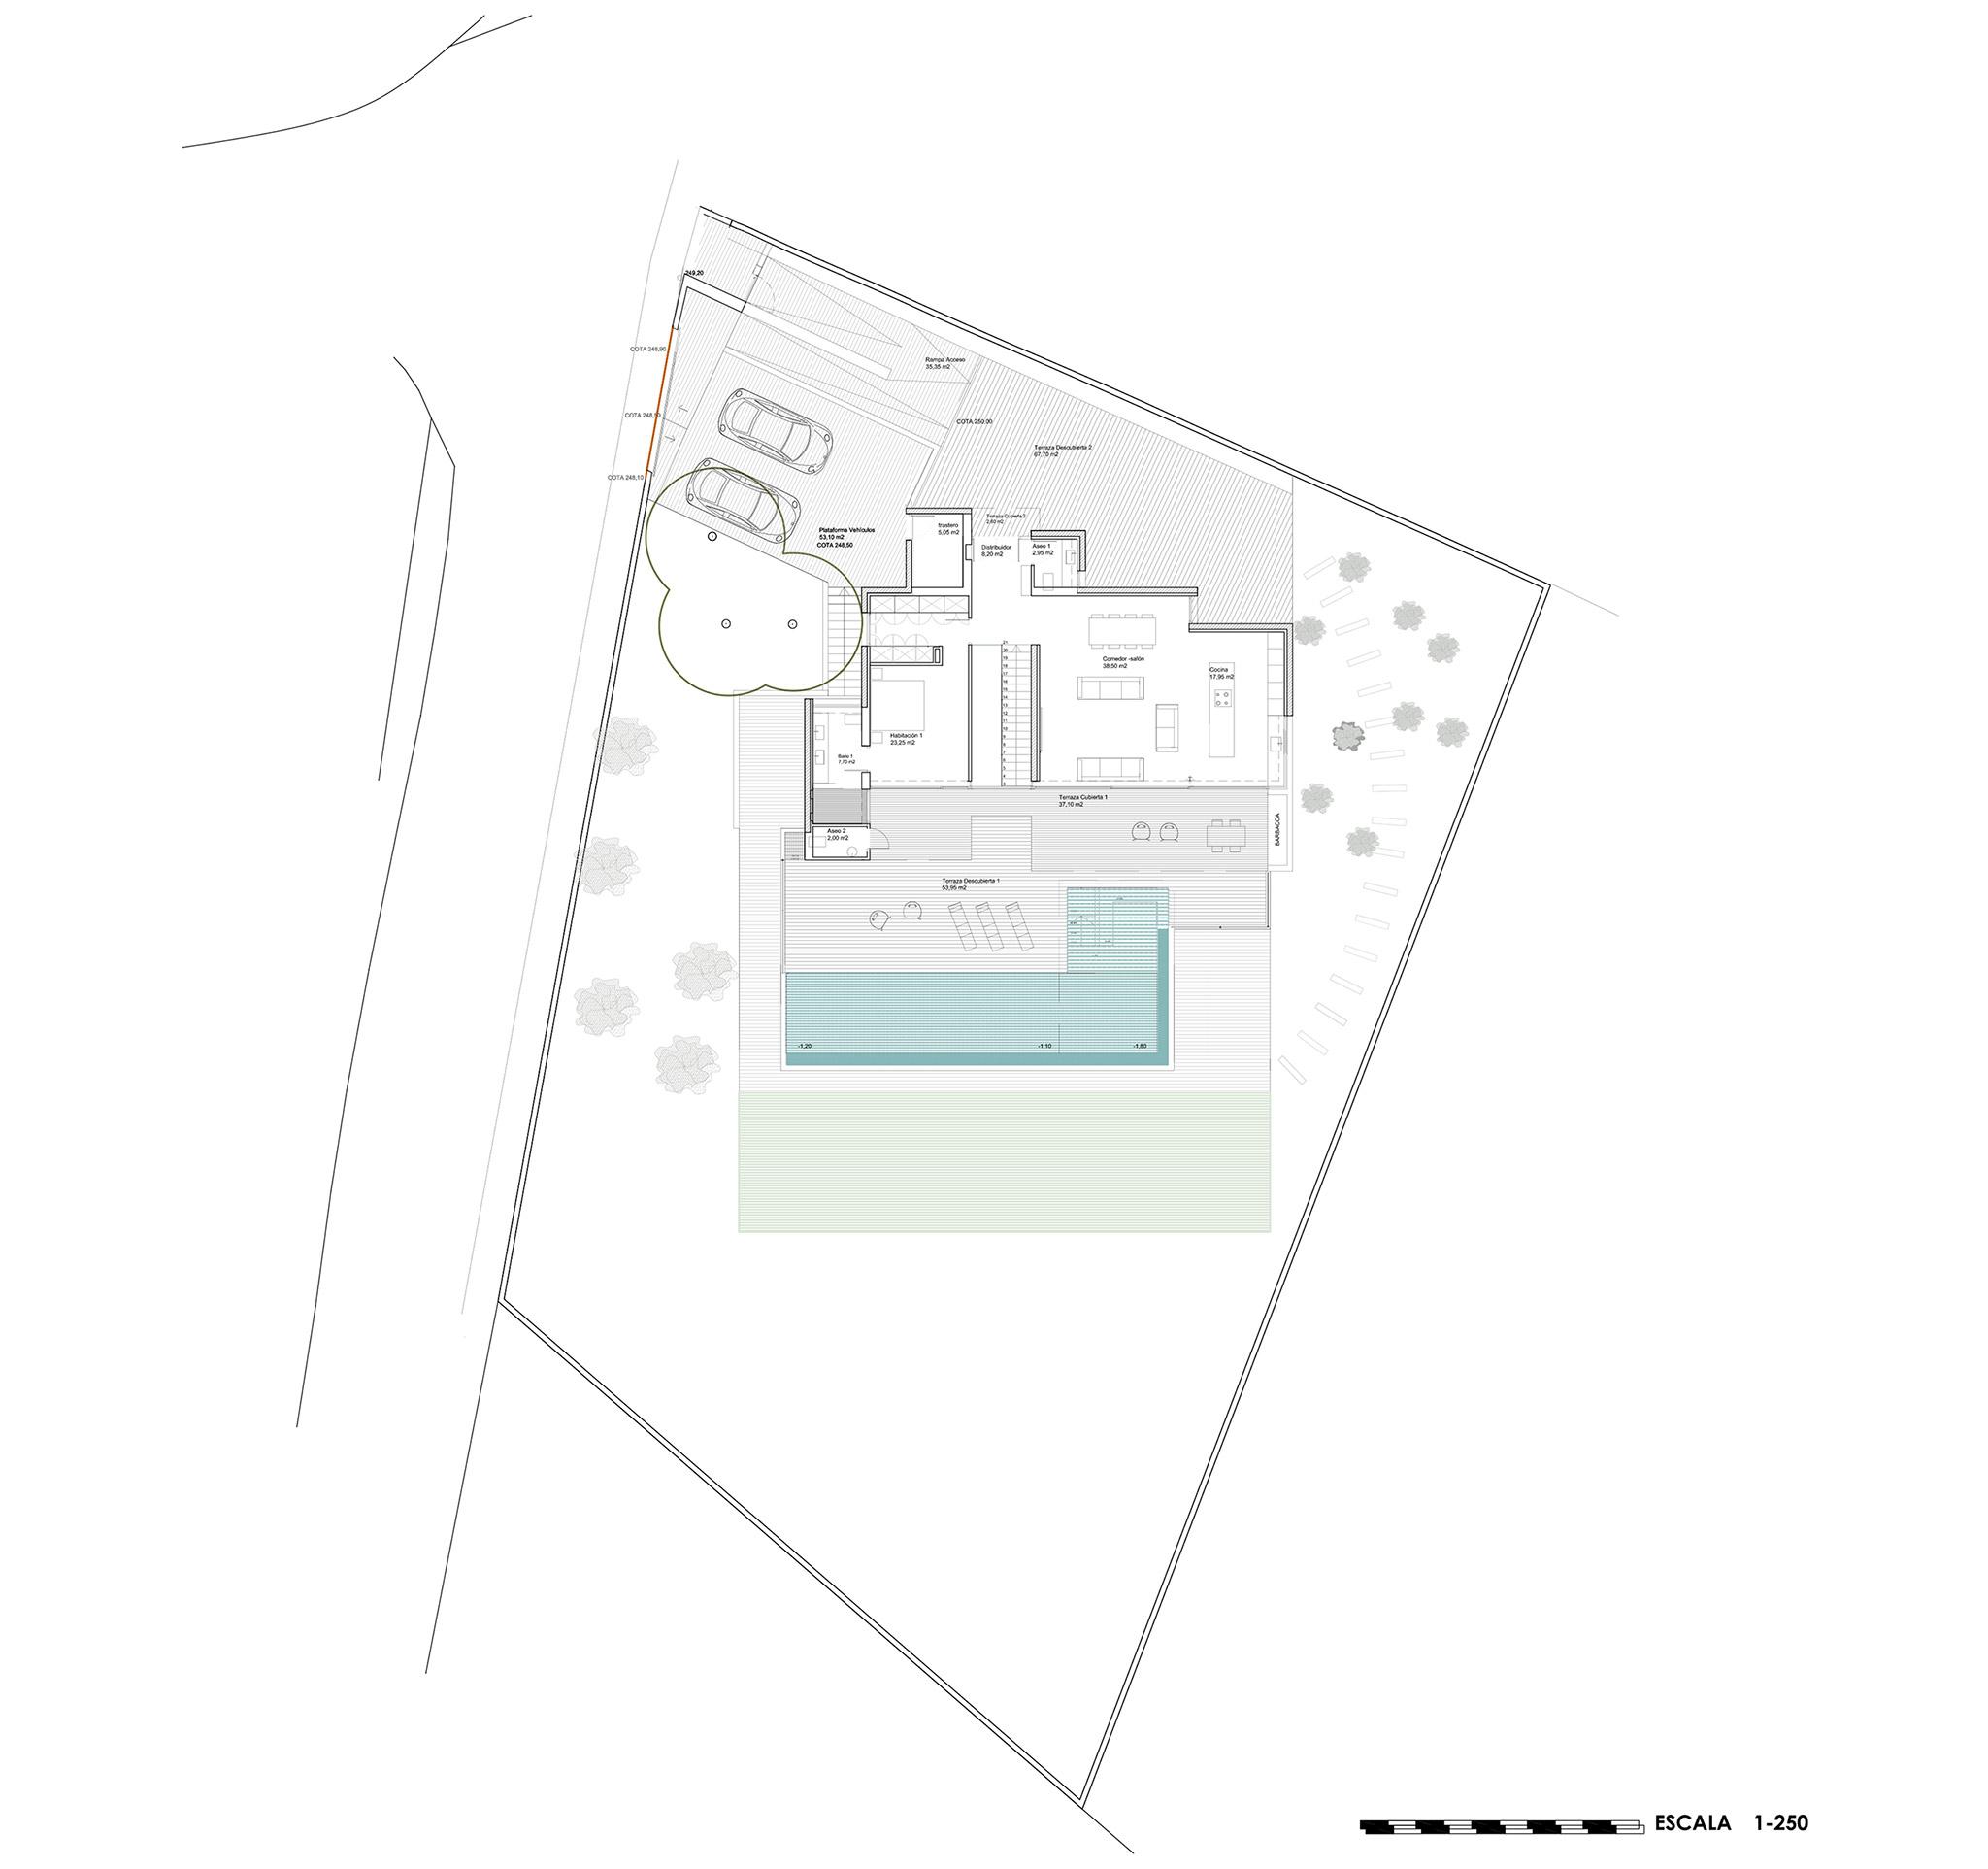 electrical floor plan calculation